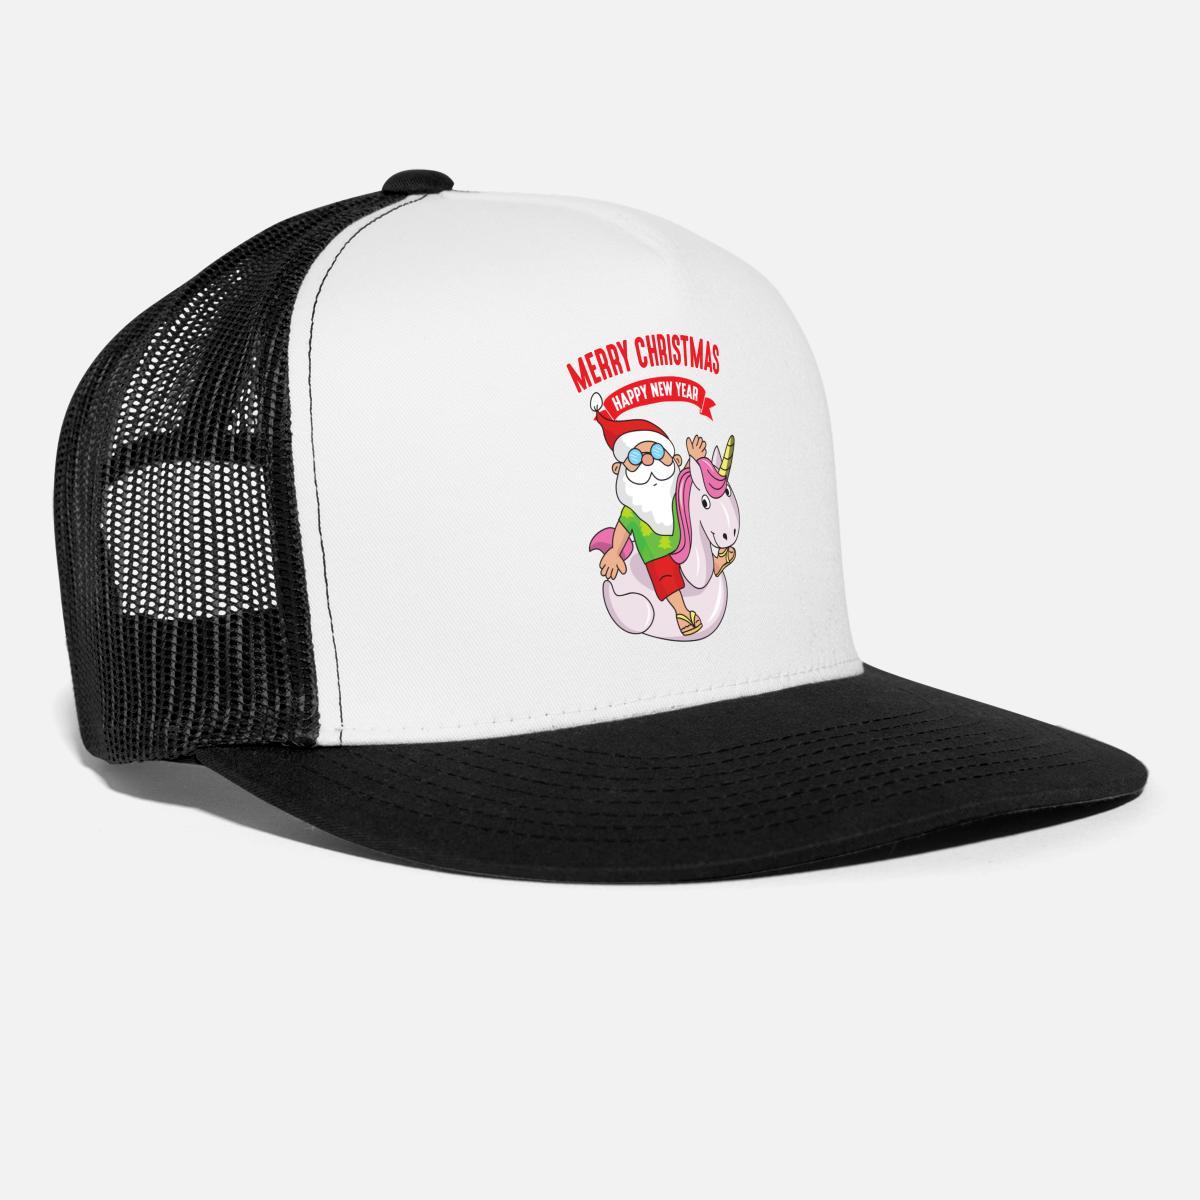 9606f4c75f0c1 Funny Santa Claus Unicorn Xmas Merry Christmas Trucker Cap